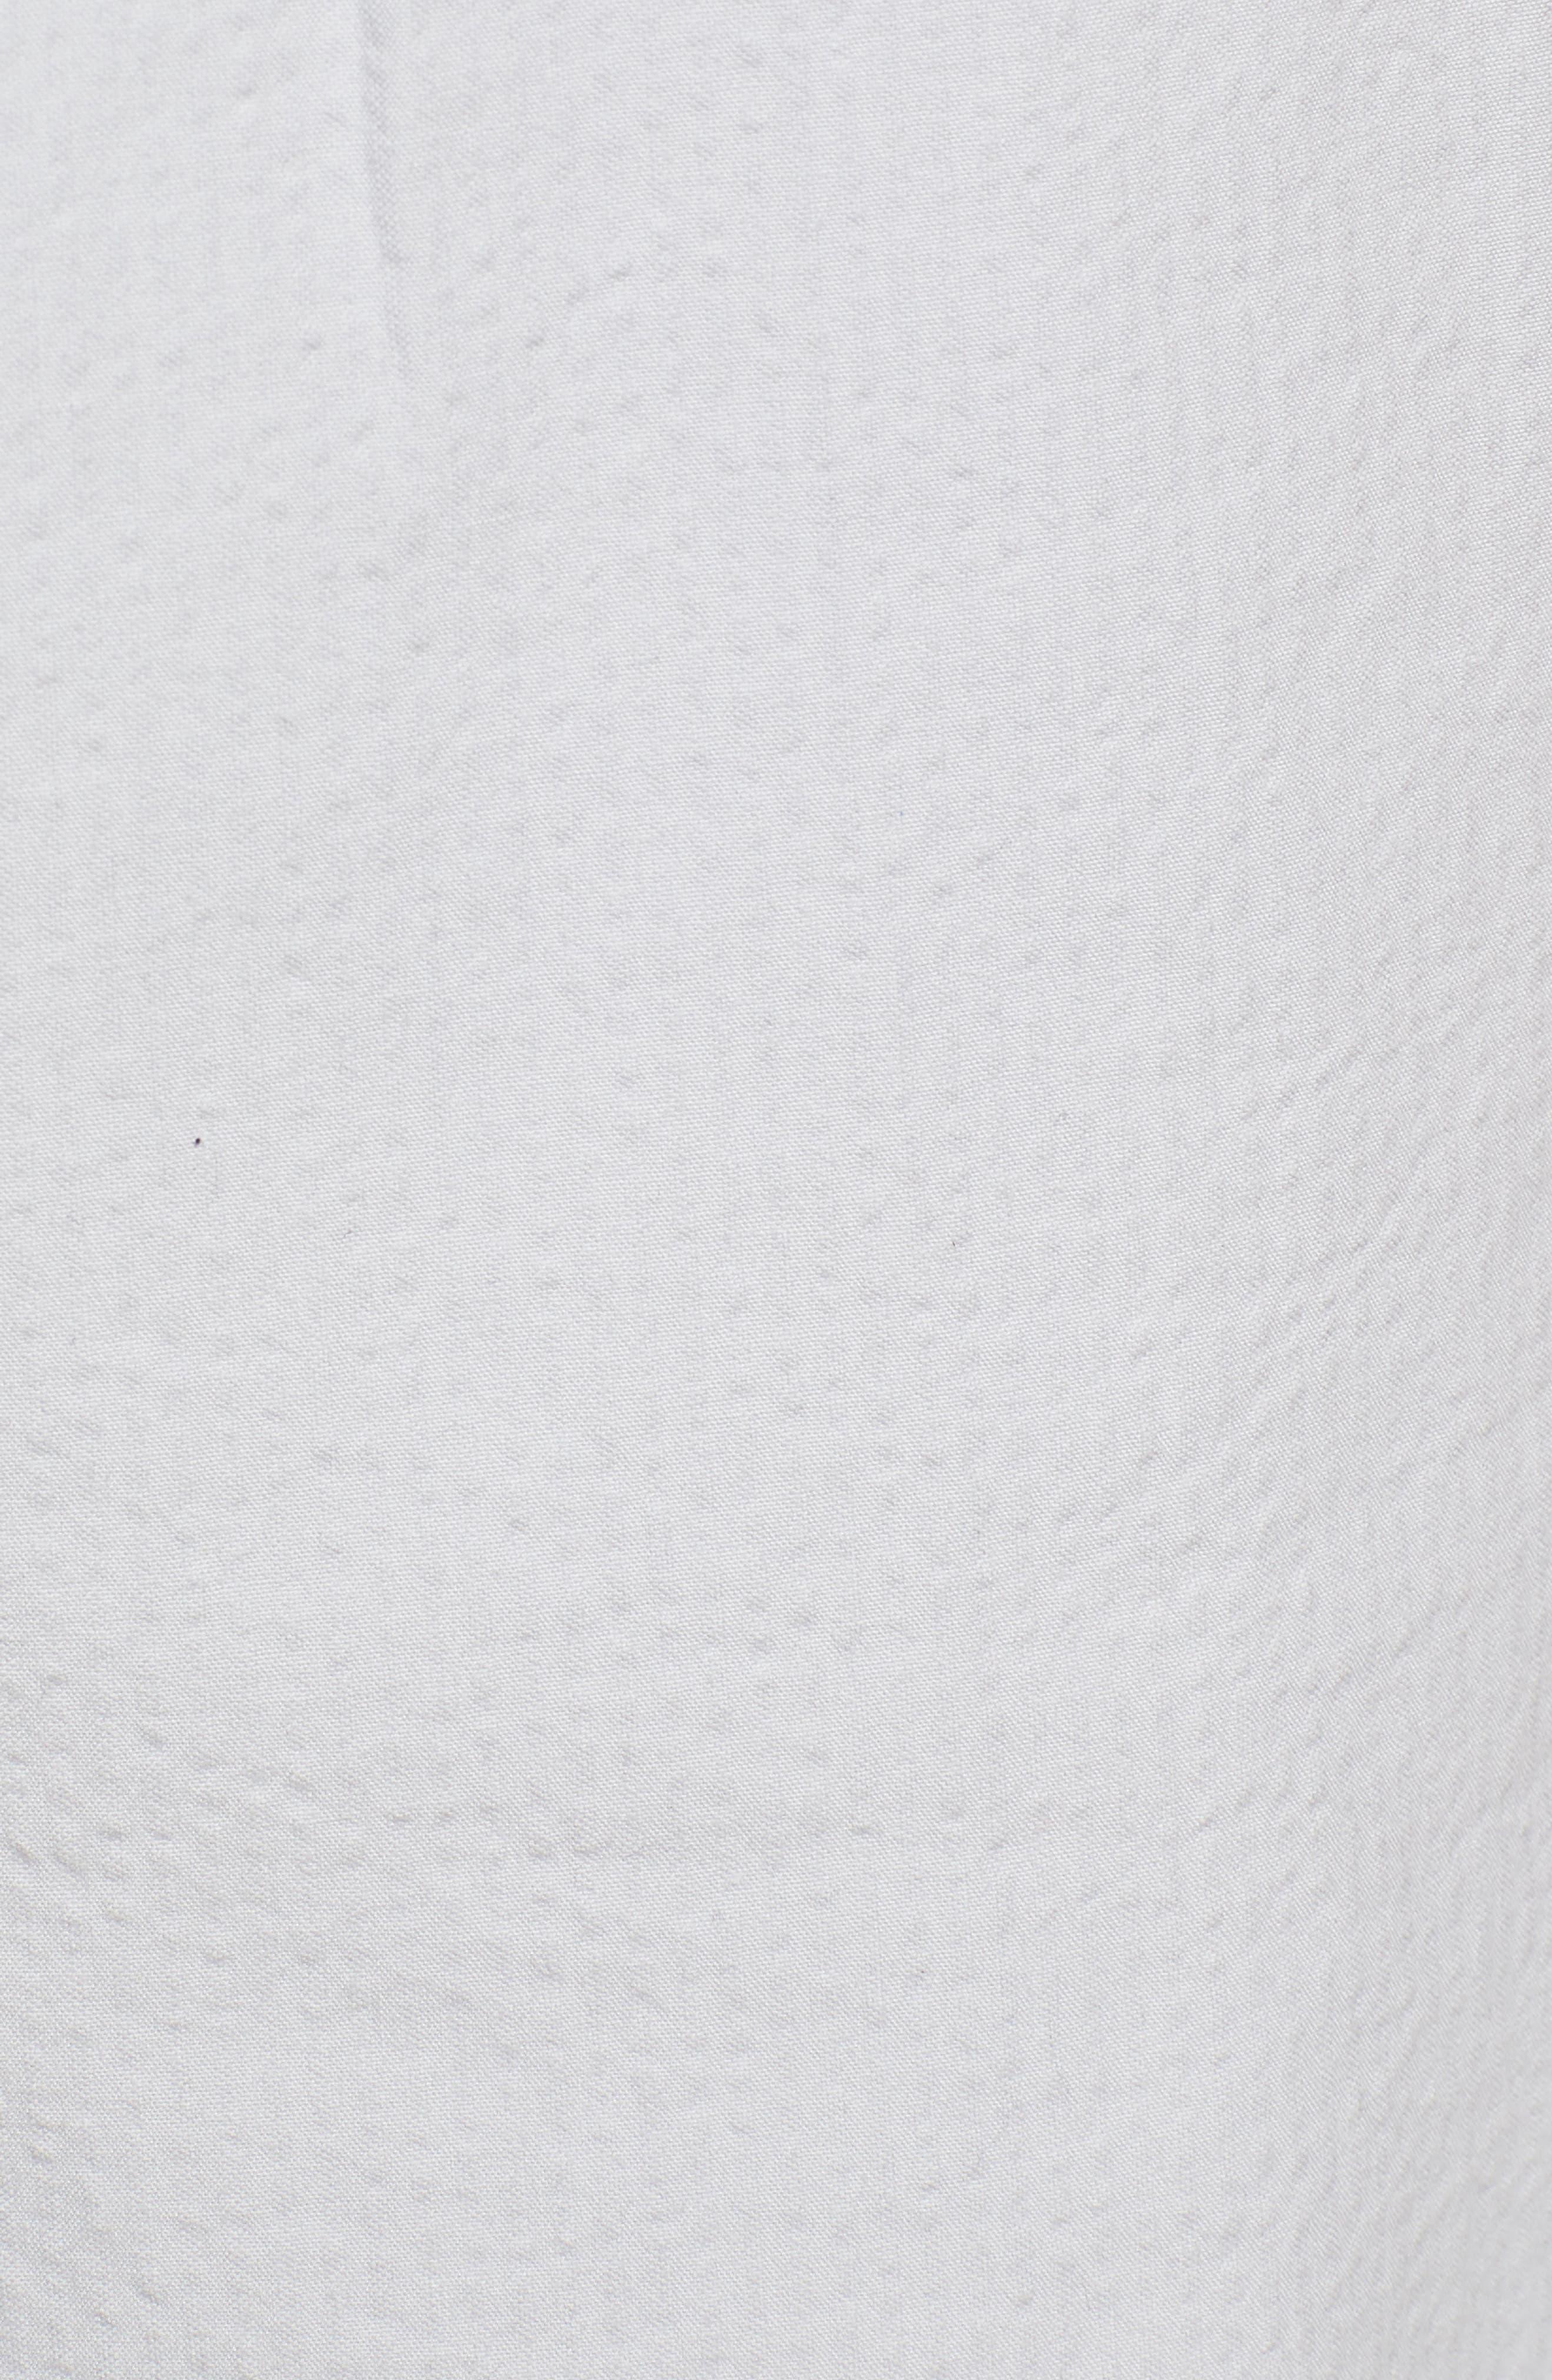 Elastic Waist Seersucker Shorts,                             Alternate thumbnail 5, color,                             030